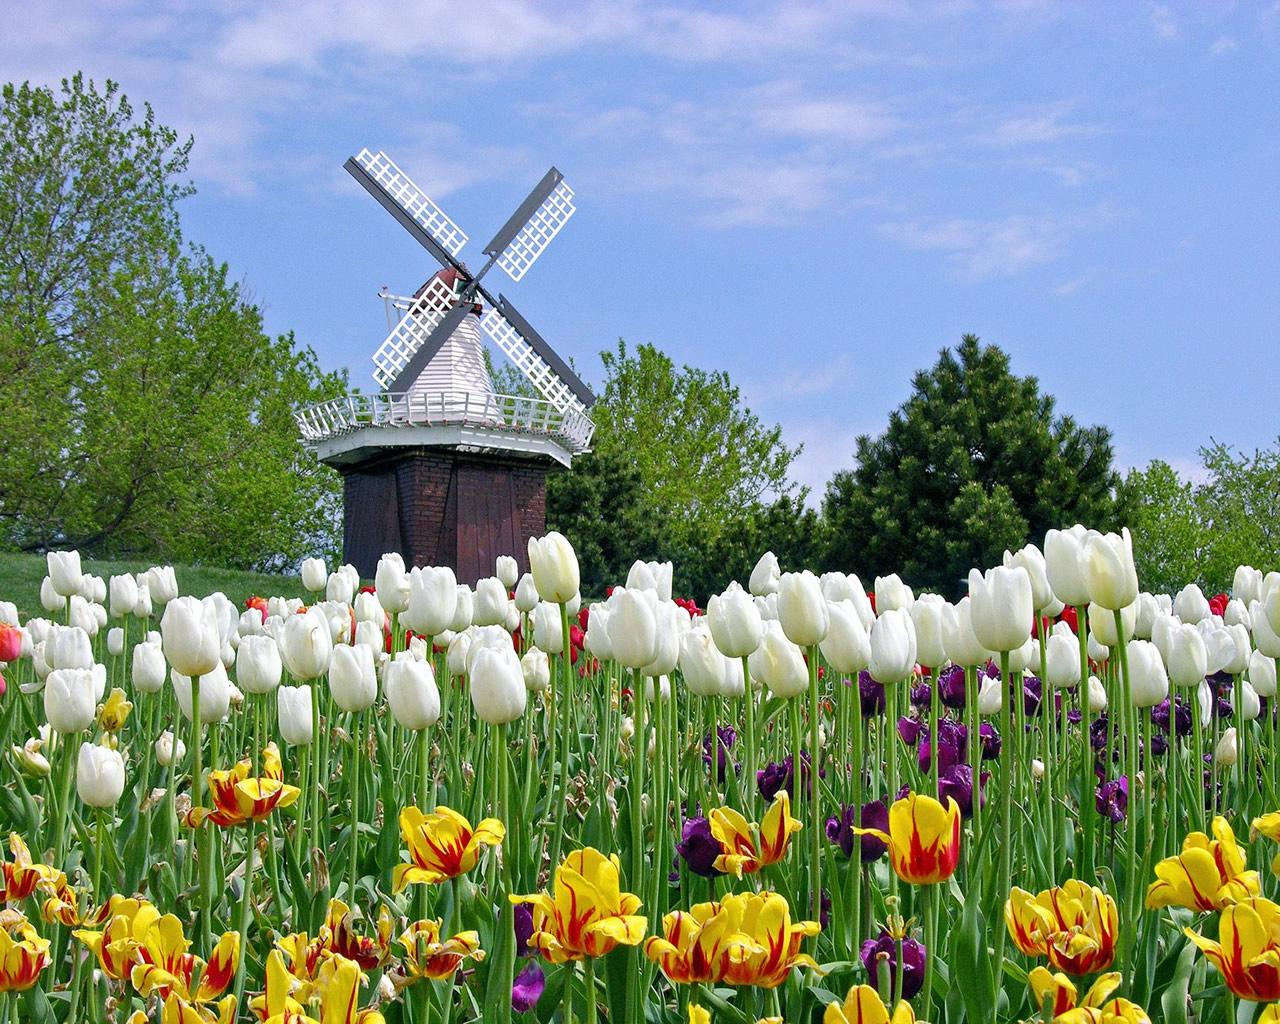 http://3.bp.blogspot.com/_6Ks7mquN8BQ/TMvbxibv7QI/AAAAAAAAAVE/wCKDmxL2Lgs/s1600/lalele_holland-tulip-wallpaper.jpg